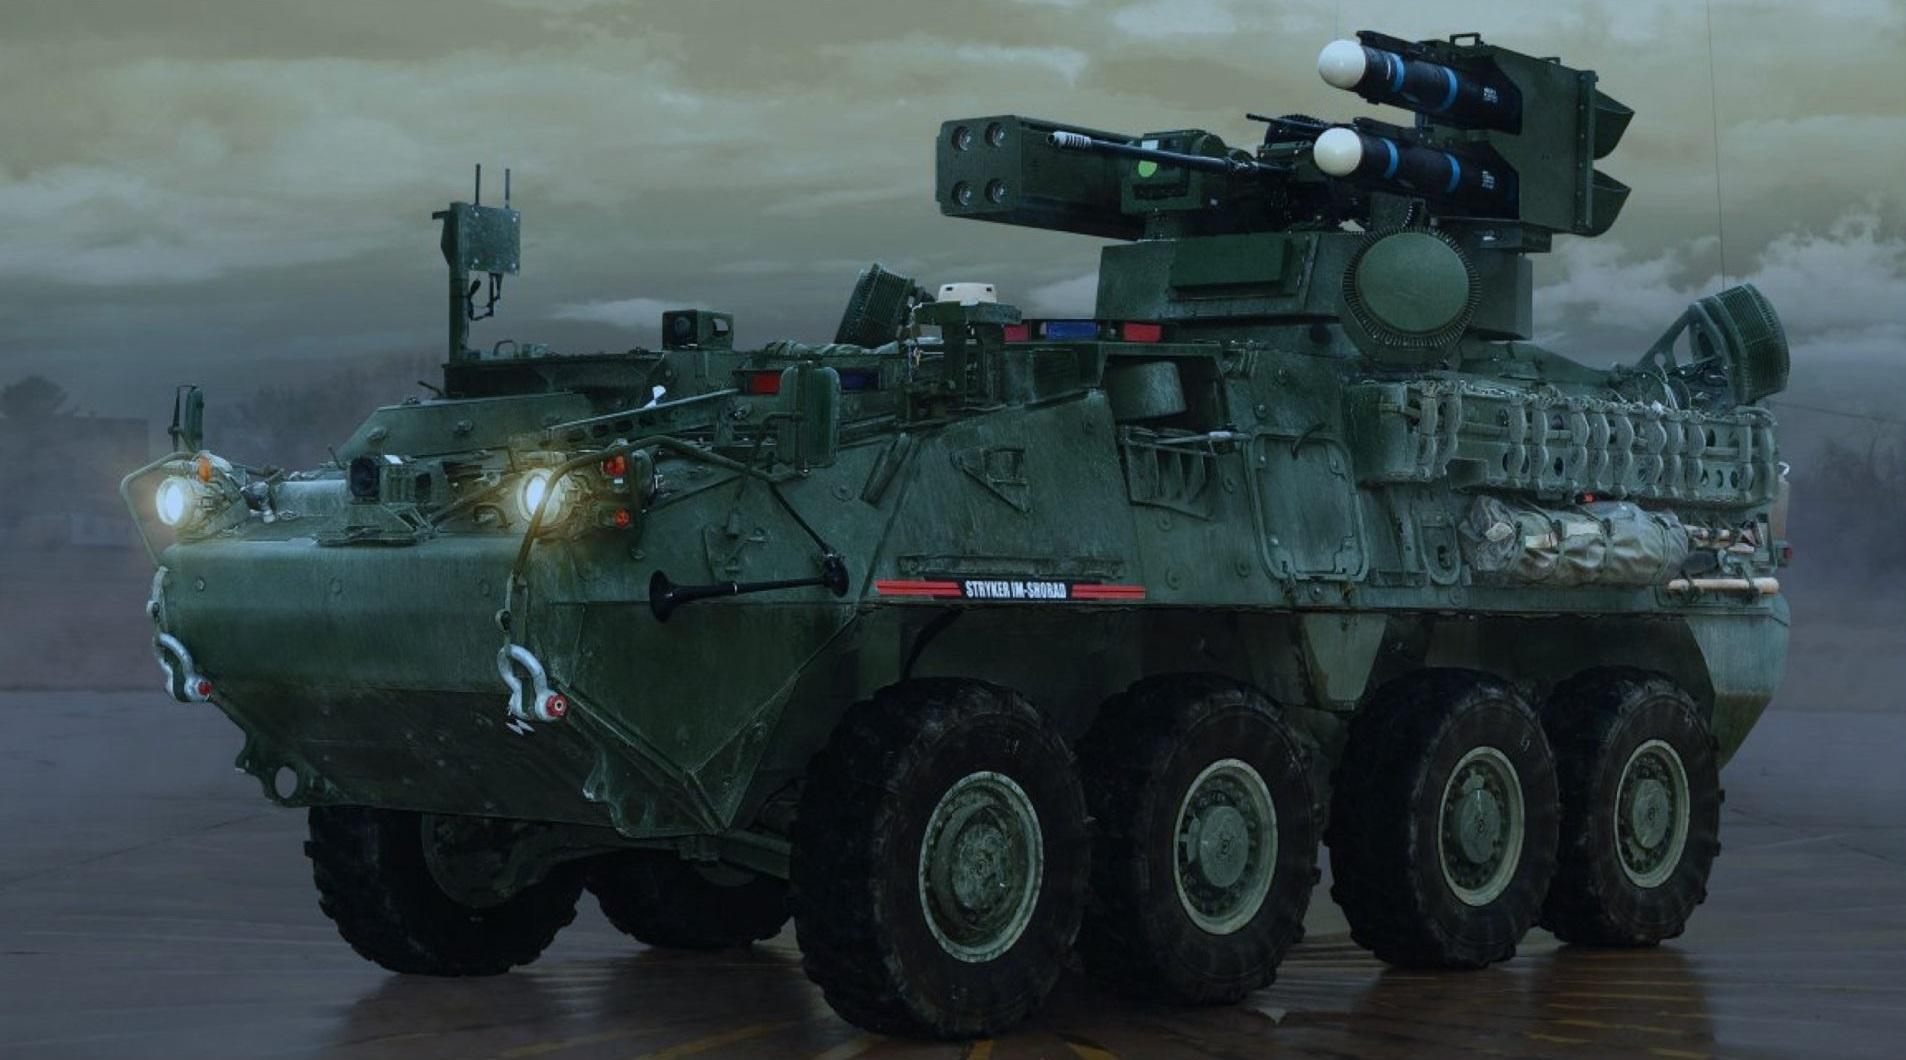 U.S. Army's Maneuver Short-Range Air Defense Increment 1 (M-SHORAD Inc. 1) program